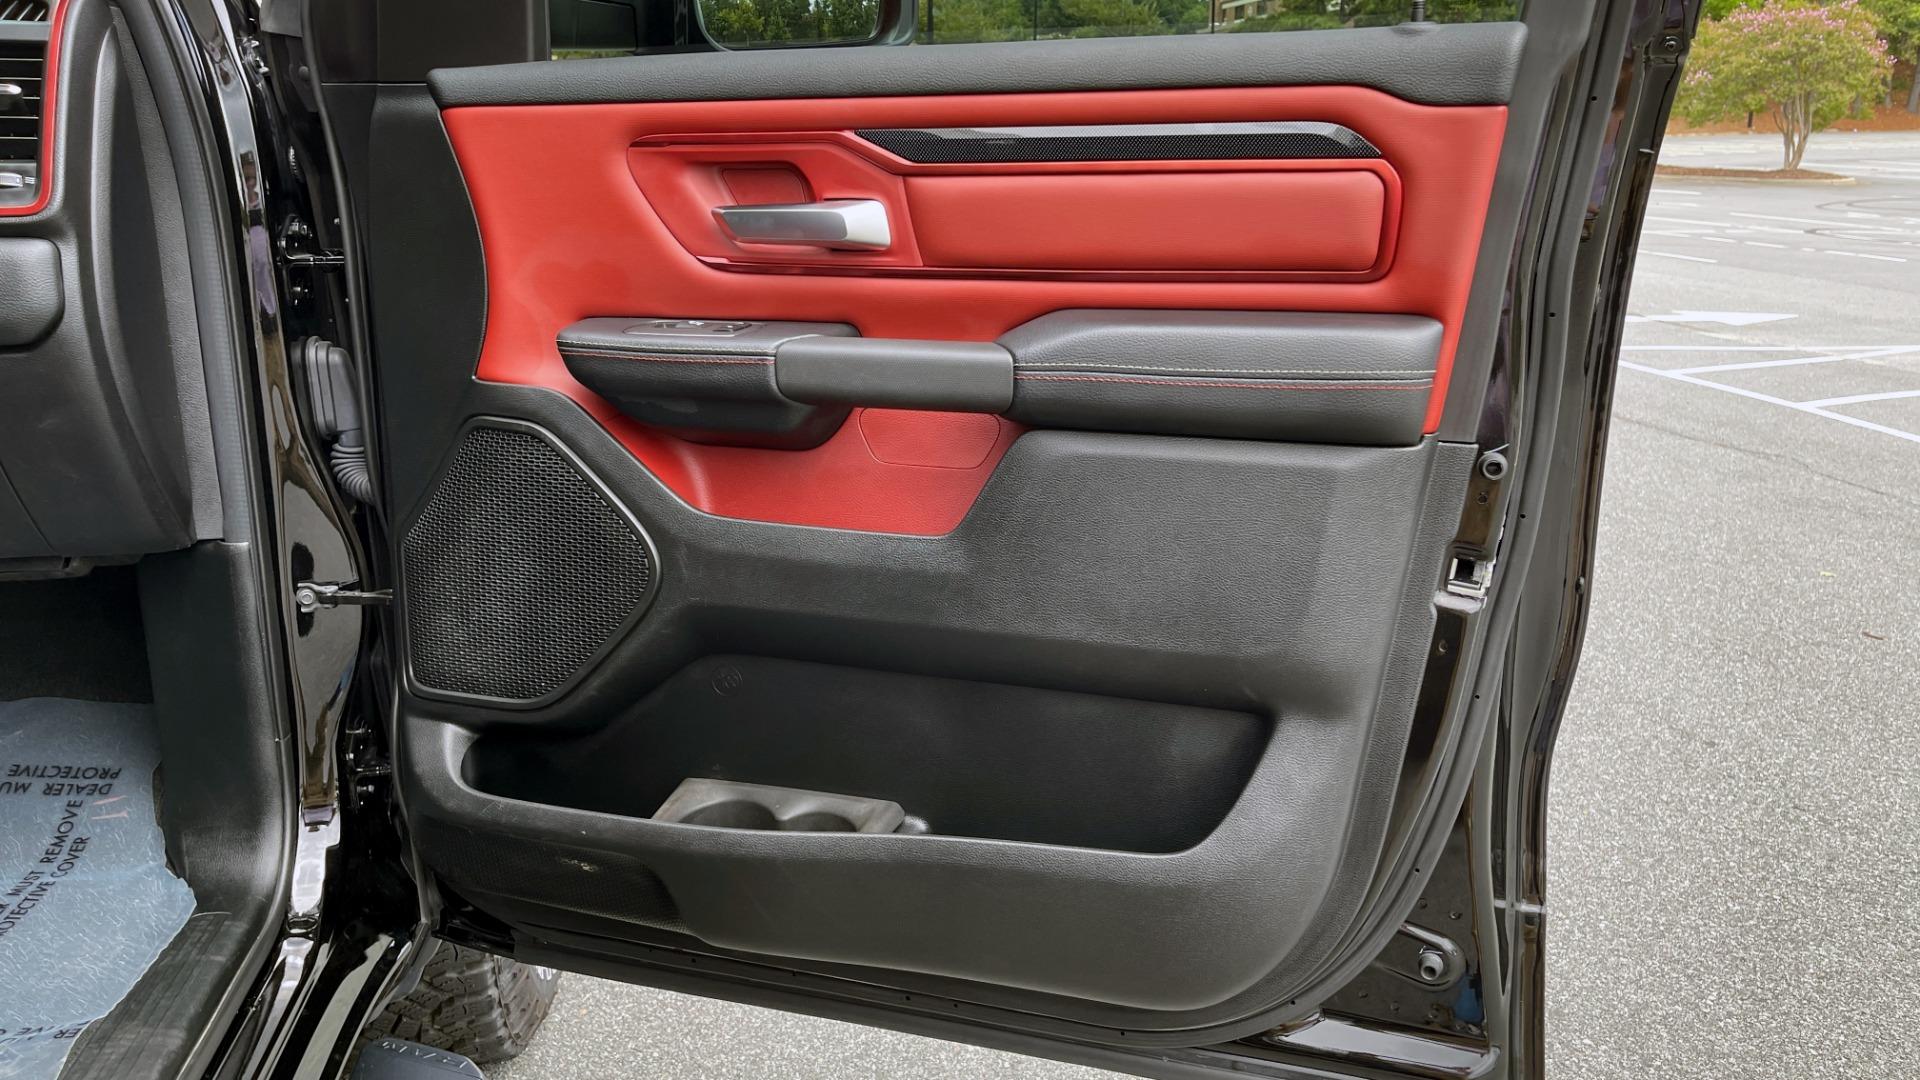 Used 2019 Ram 1500 REBEL QUADCAB 4X4 / 5.7L HEMI / 8-SPD AUTO / REMOTE START / PARK ASSIST for sale $44,495 at Formula Imports in Charlotte NC 28227 63